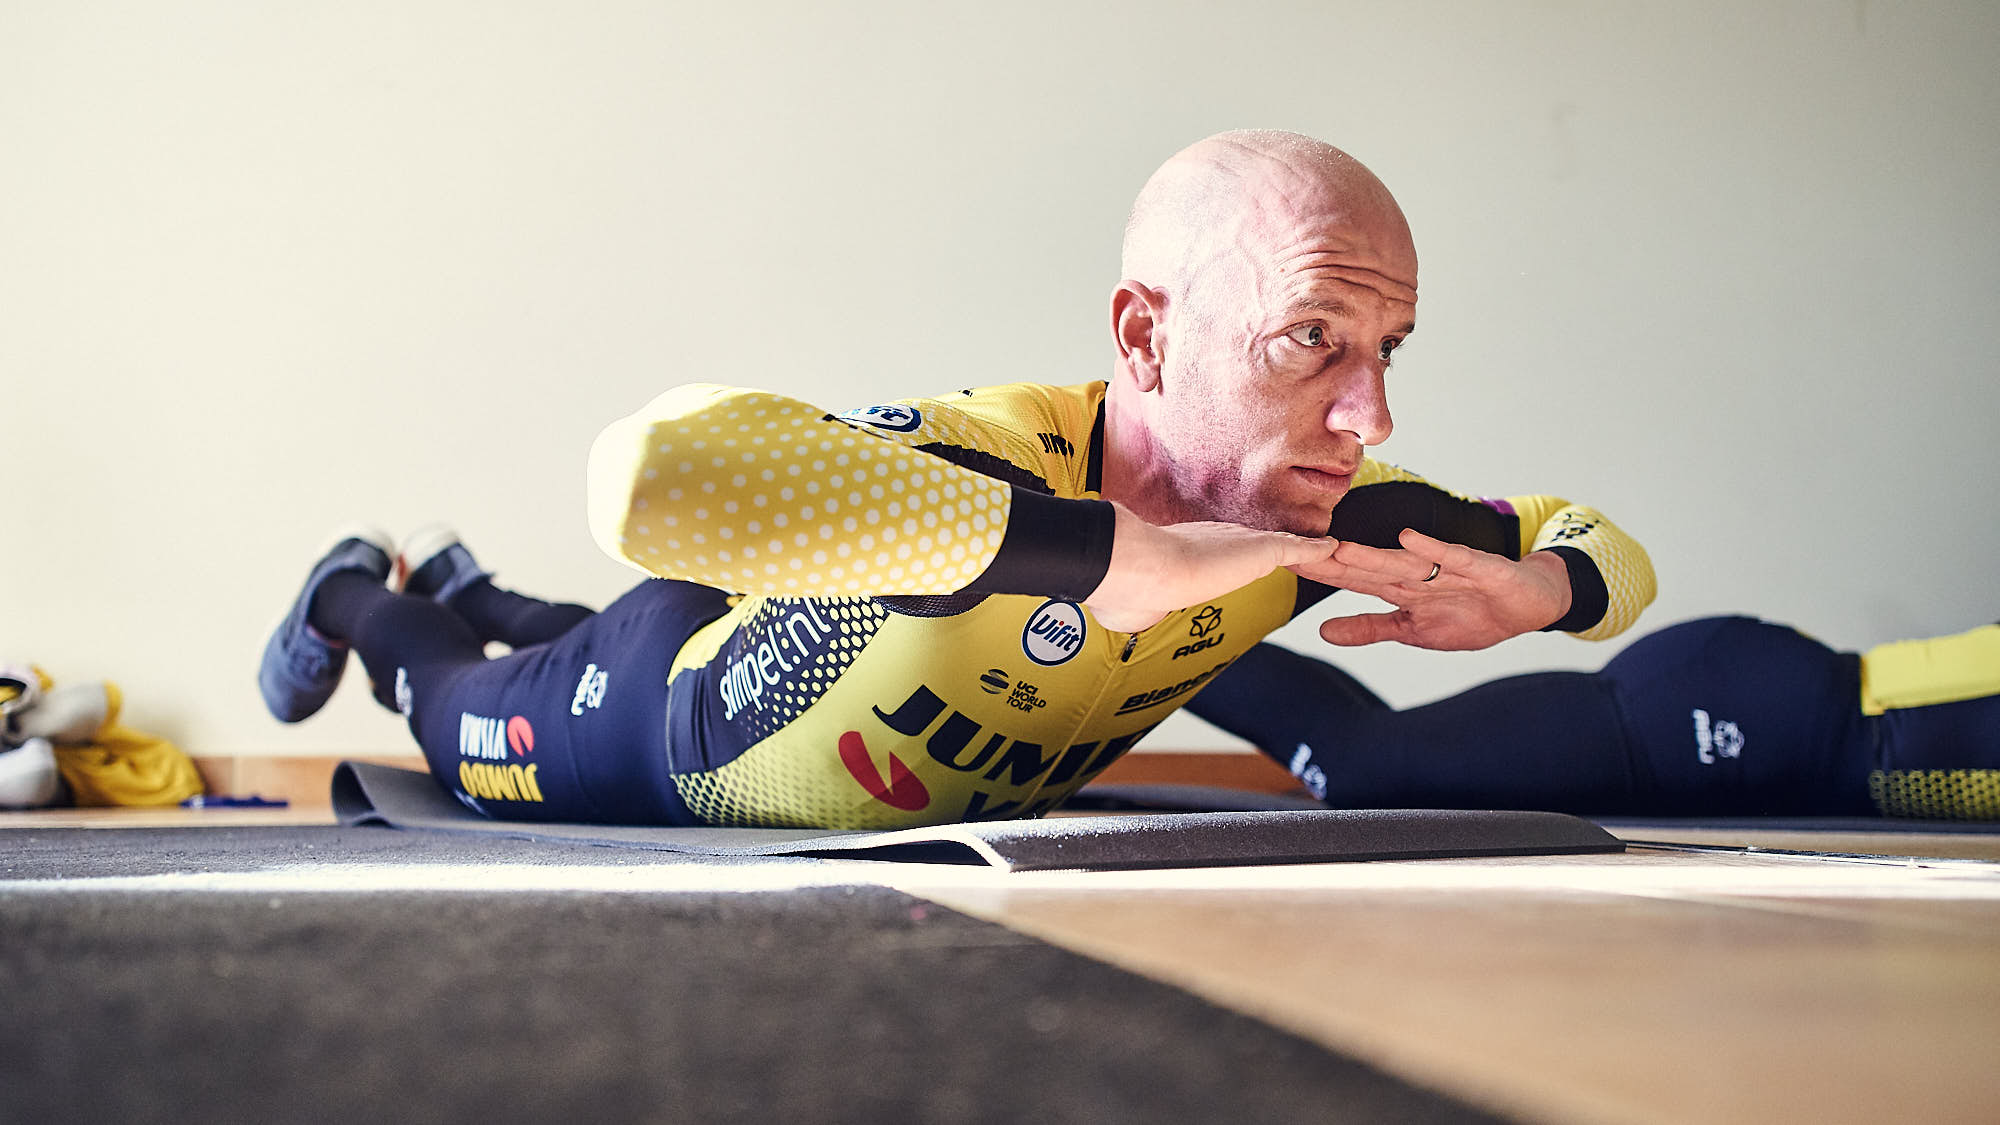 Jumbo-Visma cyclist Jos van Emden working out